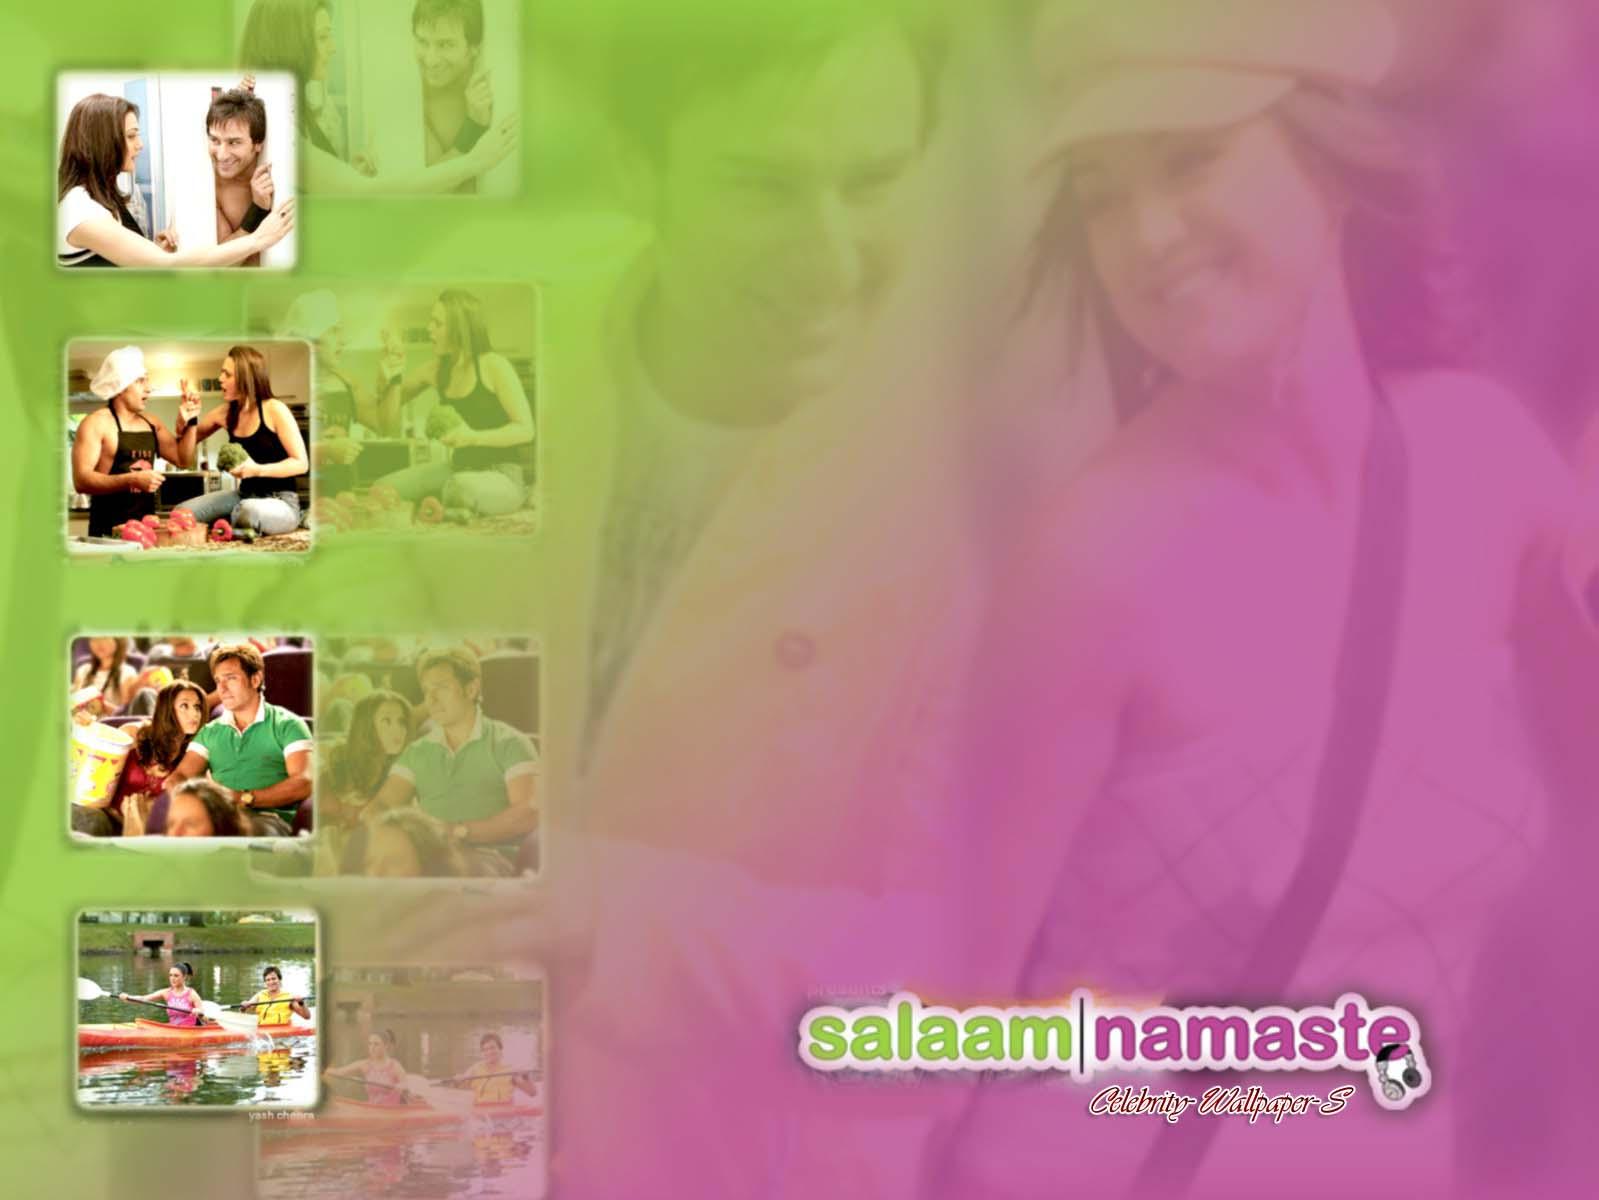 http://2.bp.blogspot.com/_zHx02JB4GE0/TSN11WrOQiI/AAAAAAAAAdw/BAQQ41rDVtQ/s1600/Preity+Zinta+Wallpaper+%25289%2529.jpg